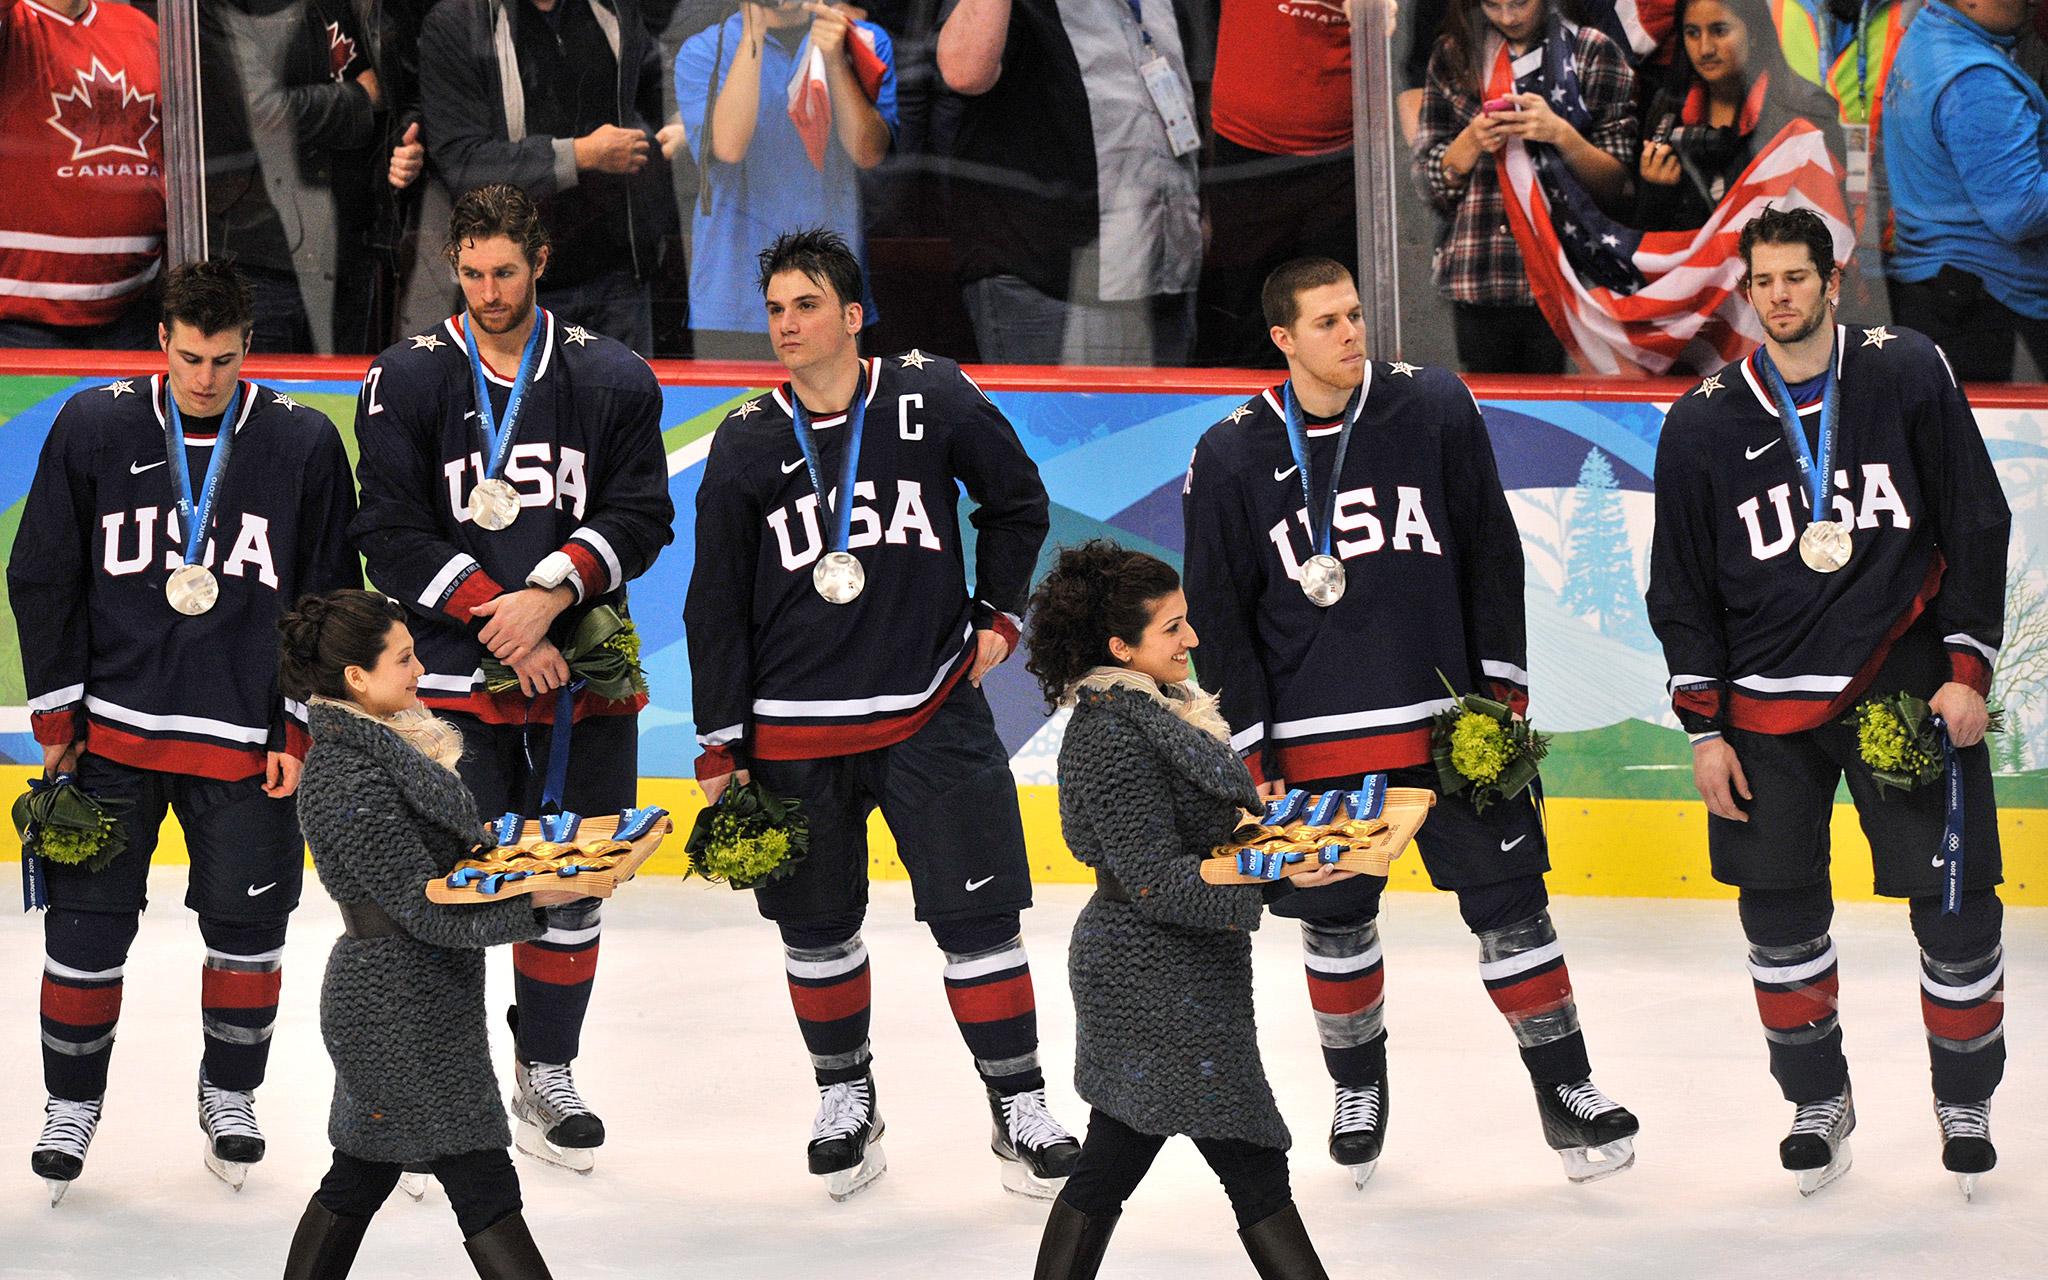 USA Wins Silver